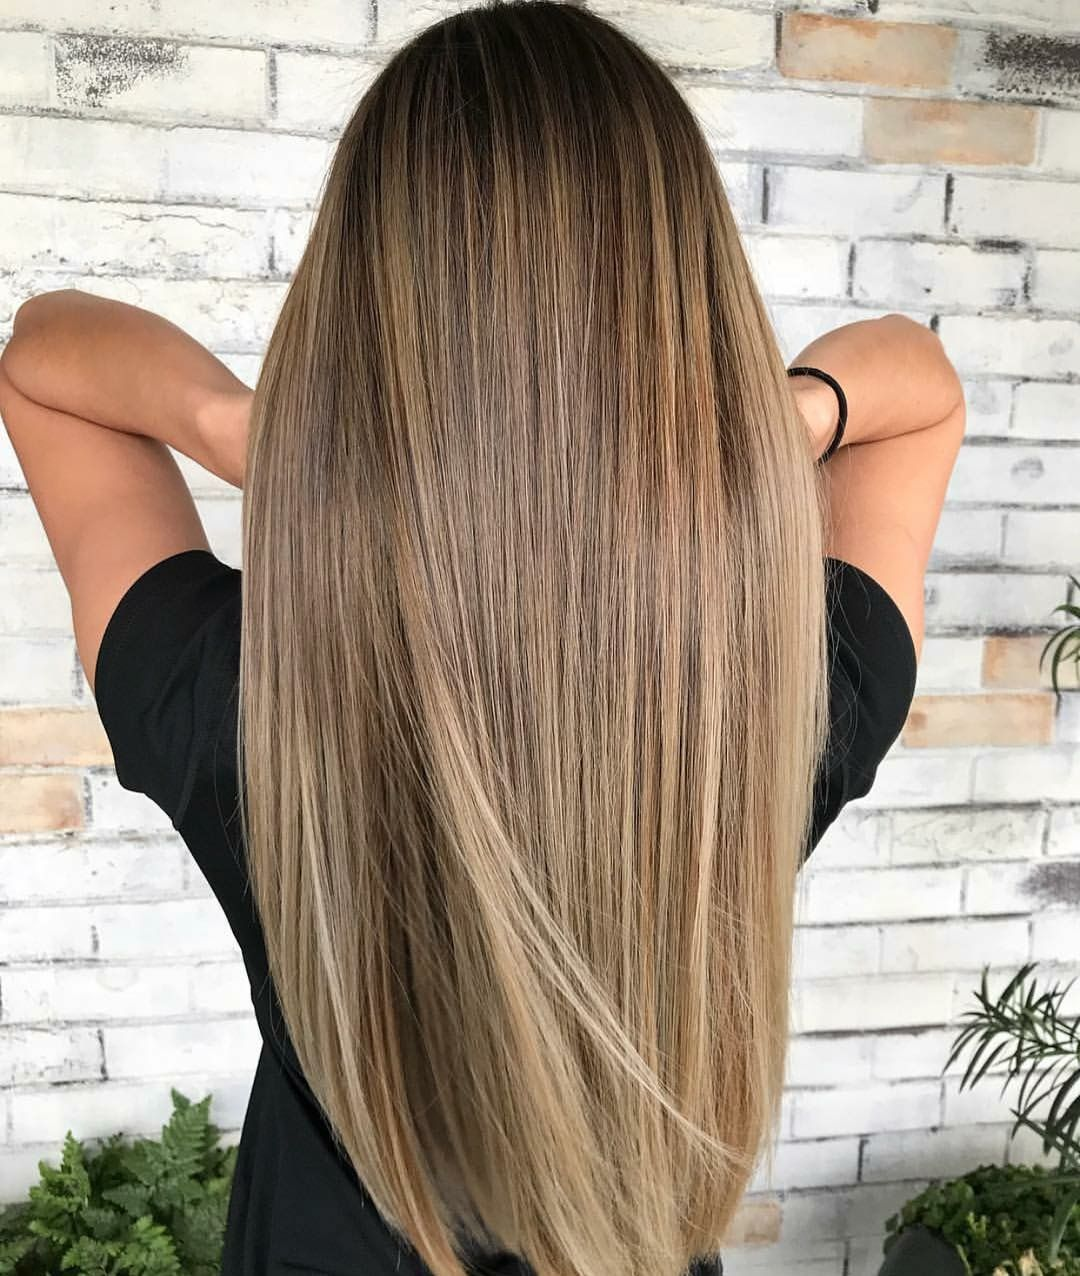 Ready Balayage Straight Hair Highlights Brown Hair Balayage Brown Hair Balayage